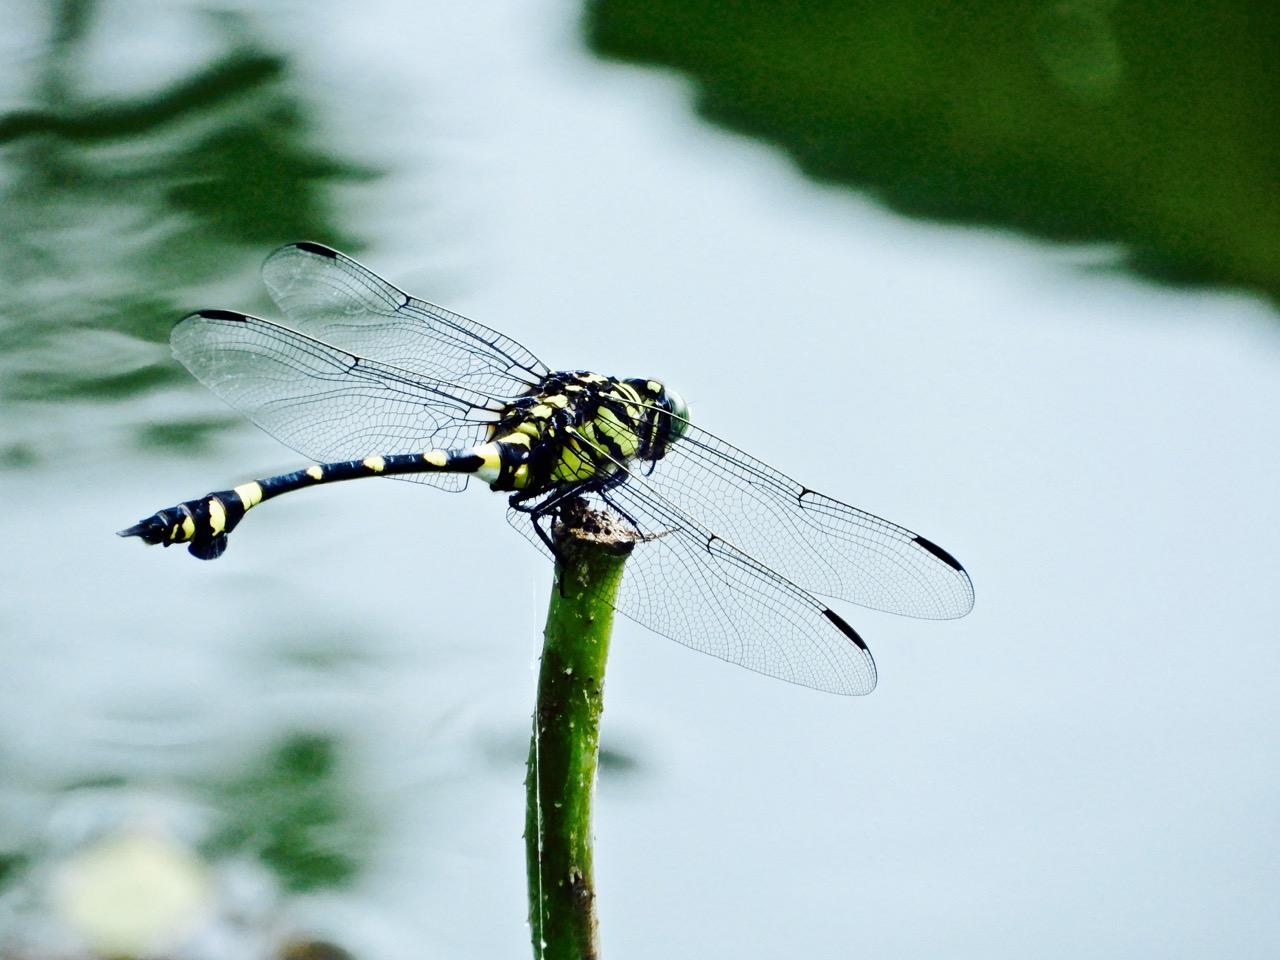 Arthur旅行笔记:夏天的红蜻蜓